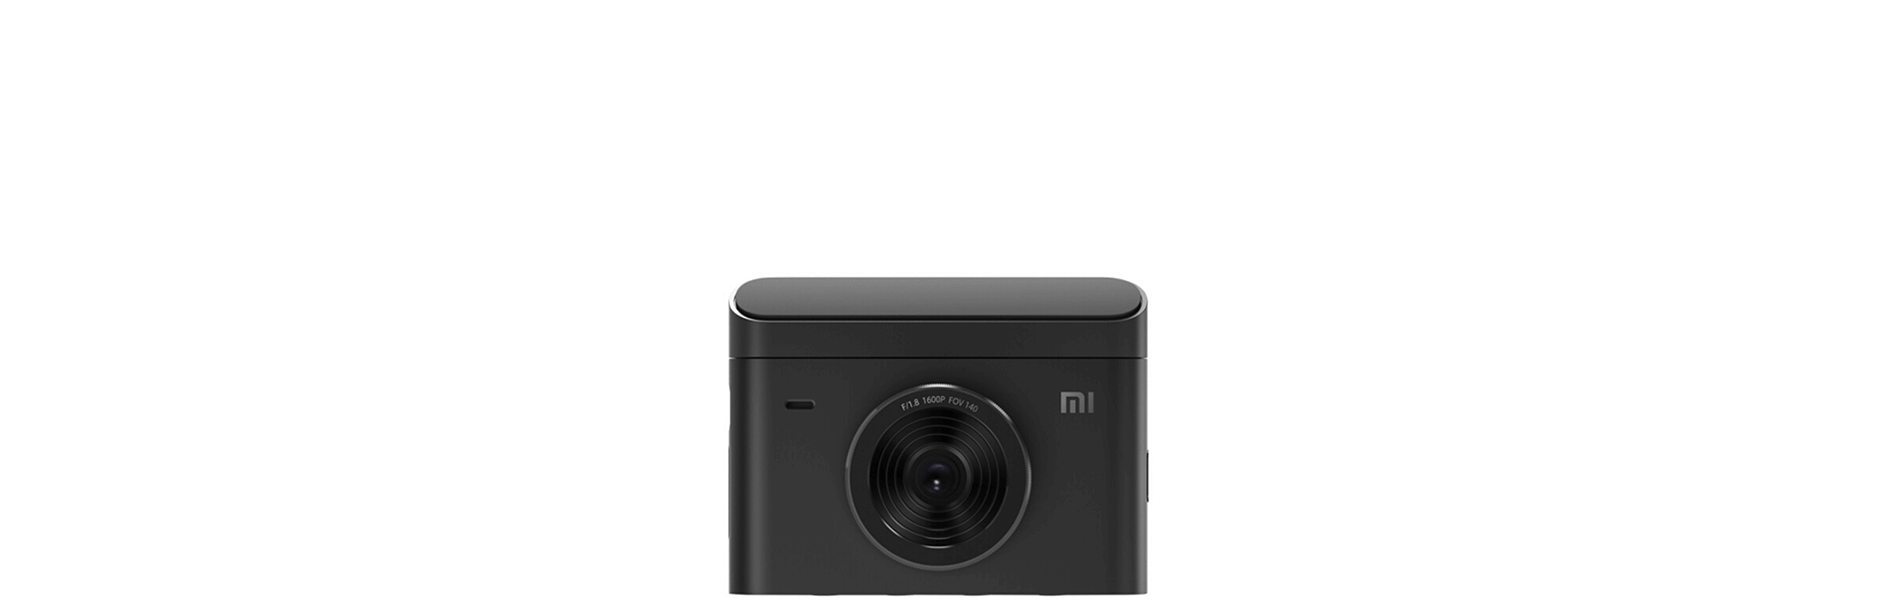 Xiaomi Mi Dash Cam 2 2K